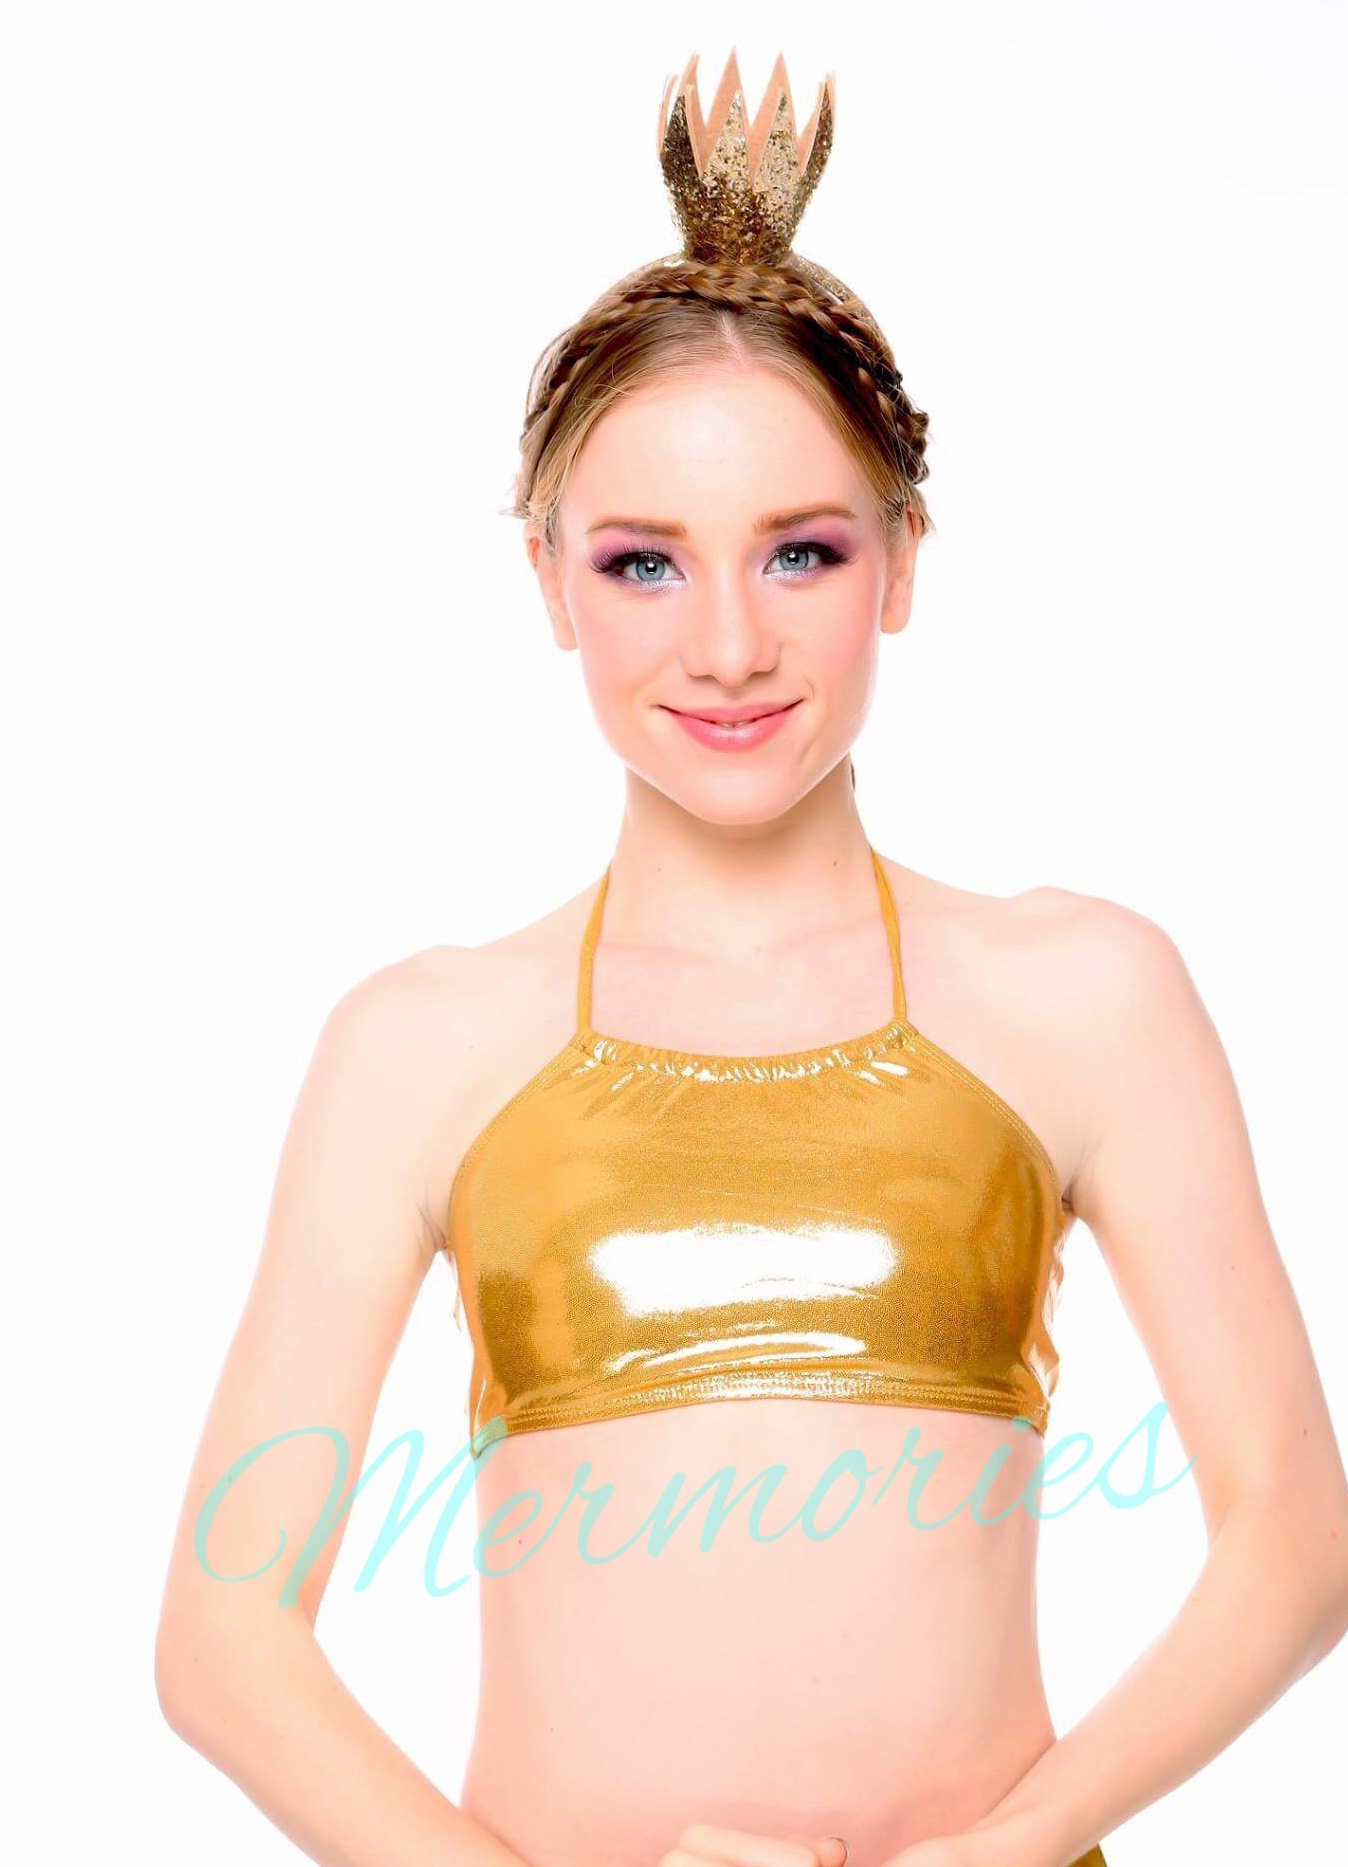 Ravenna Gold Glitter แบบผูกคอครึ่งตัว